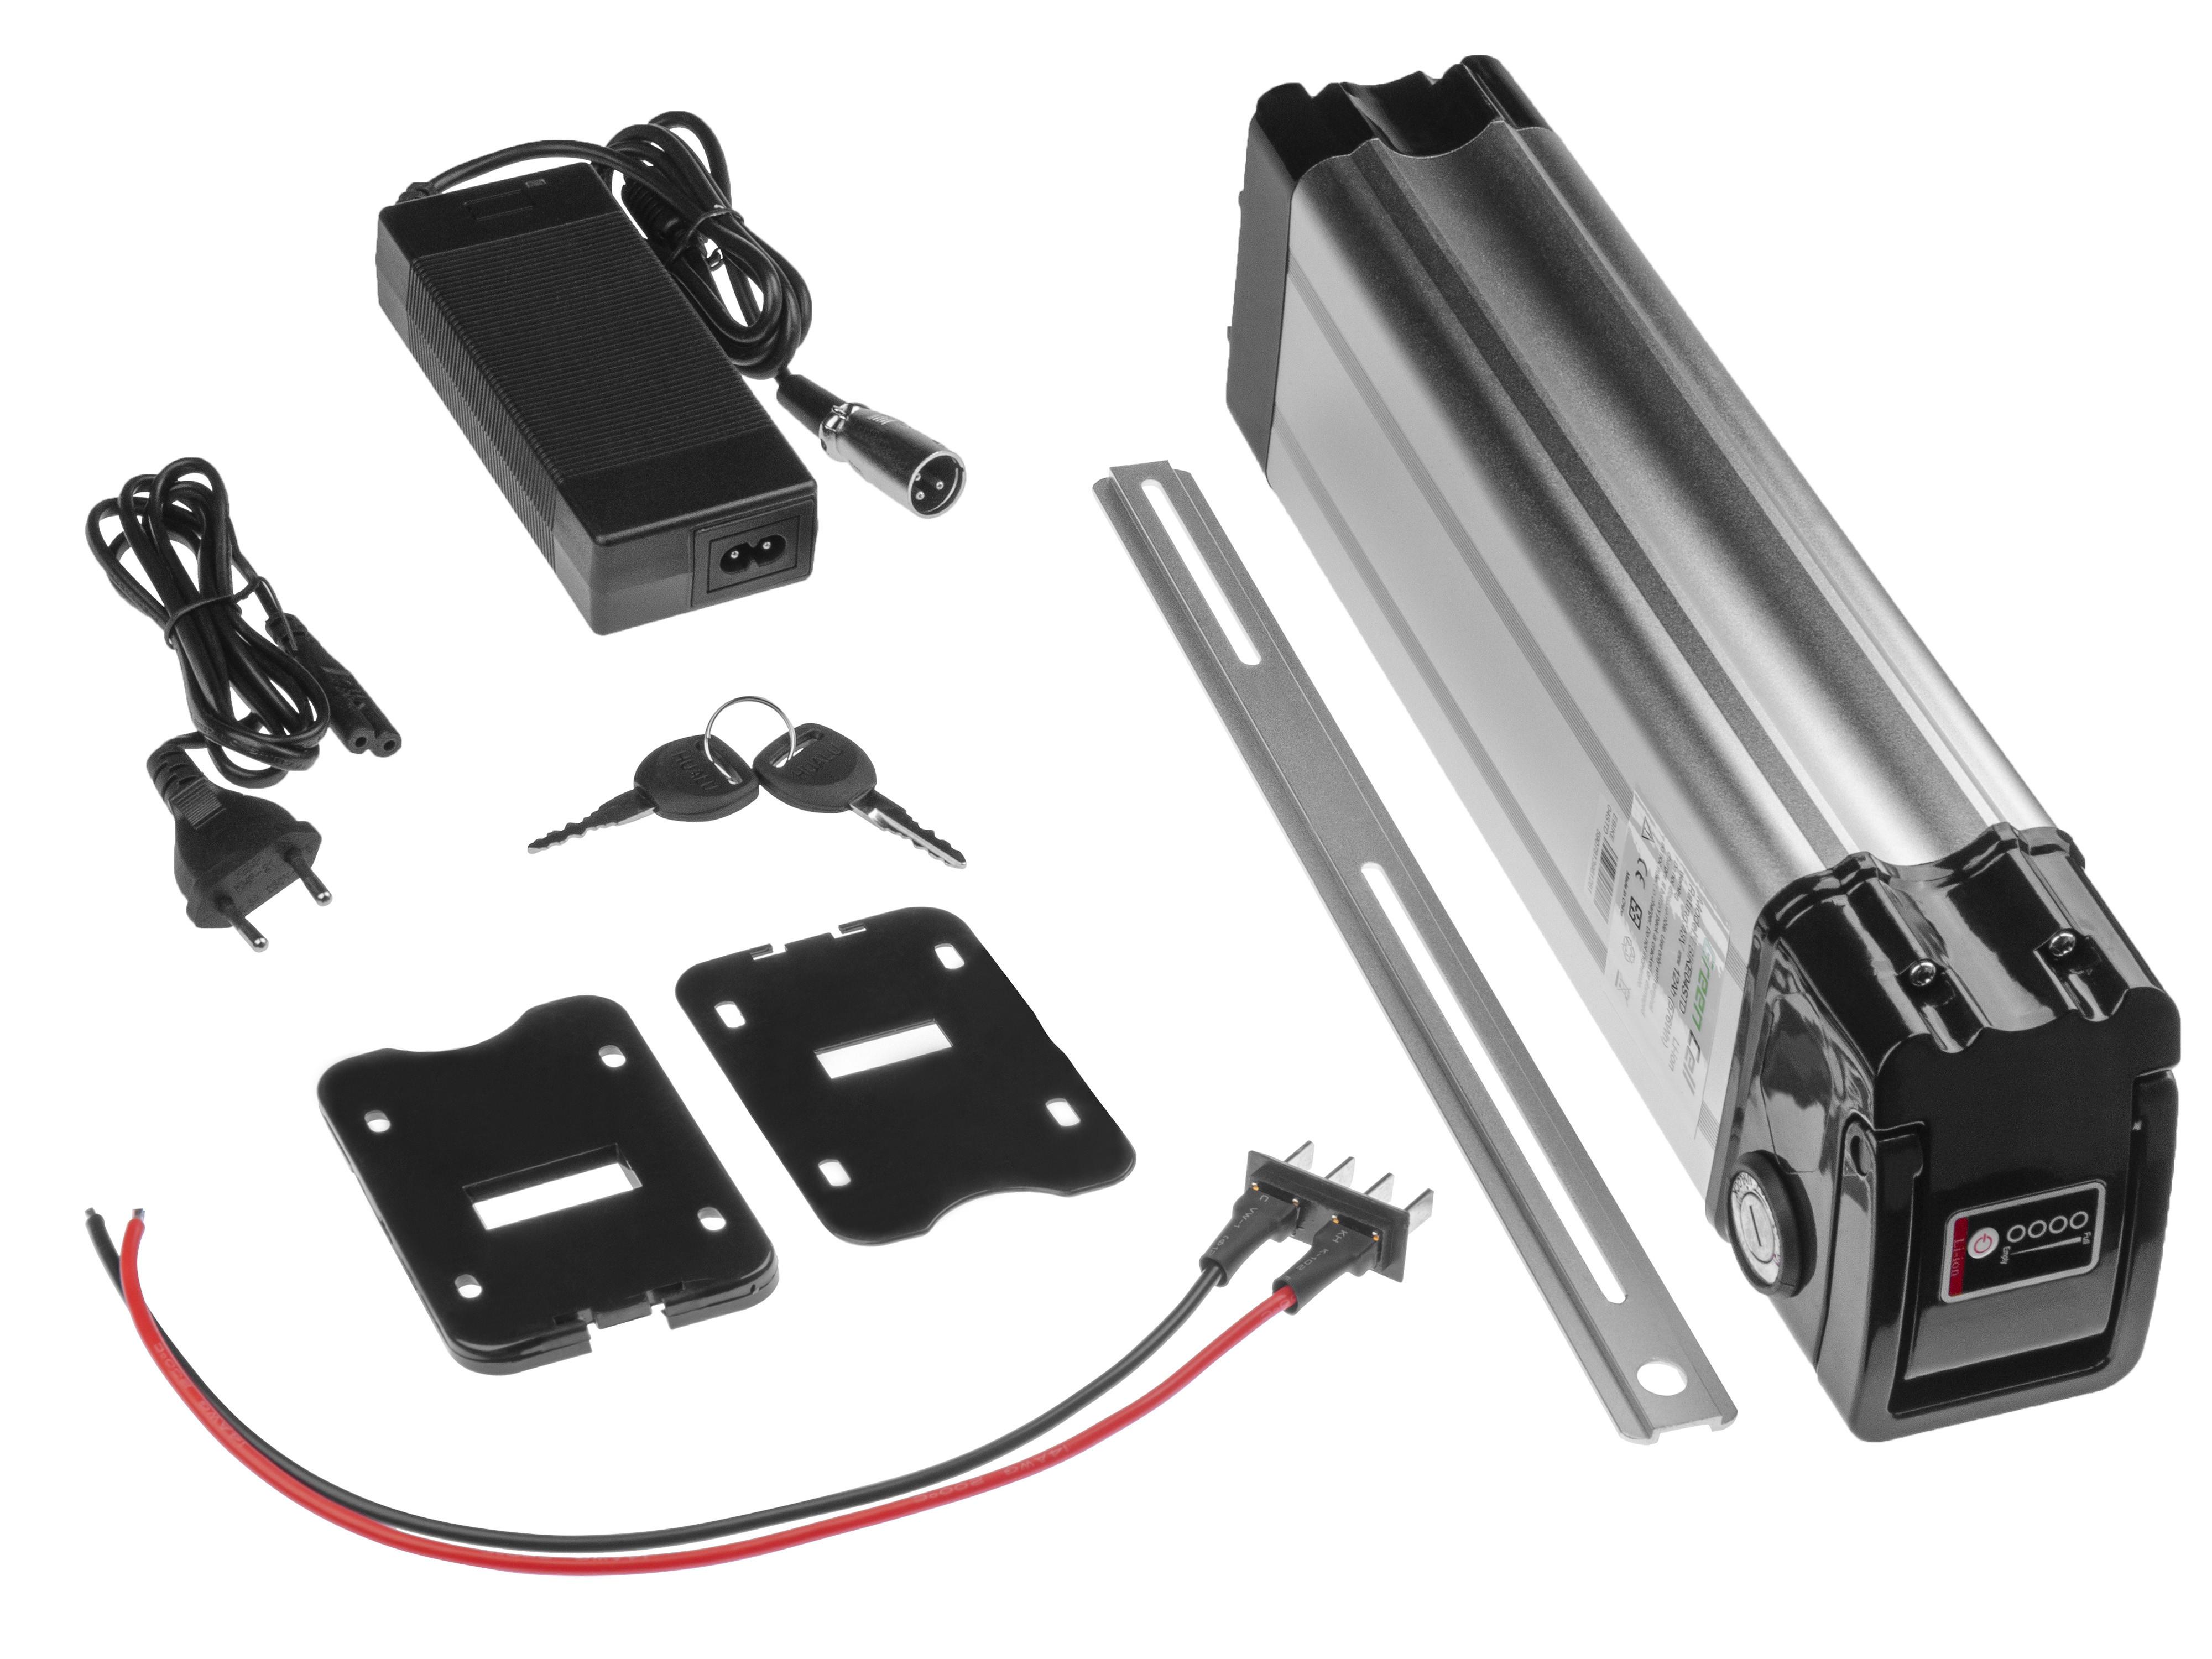 Battery Green Cell Silverfish 48V 11.6Ah 556.8Wh for E-Bike Pedelec